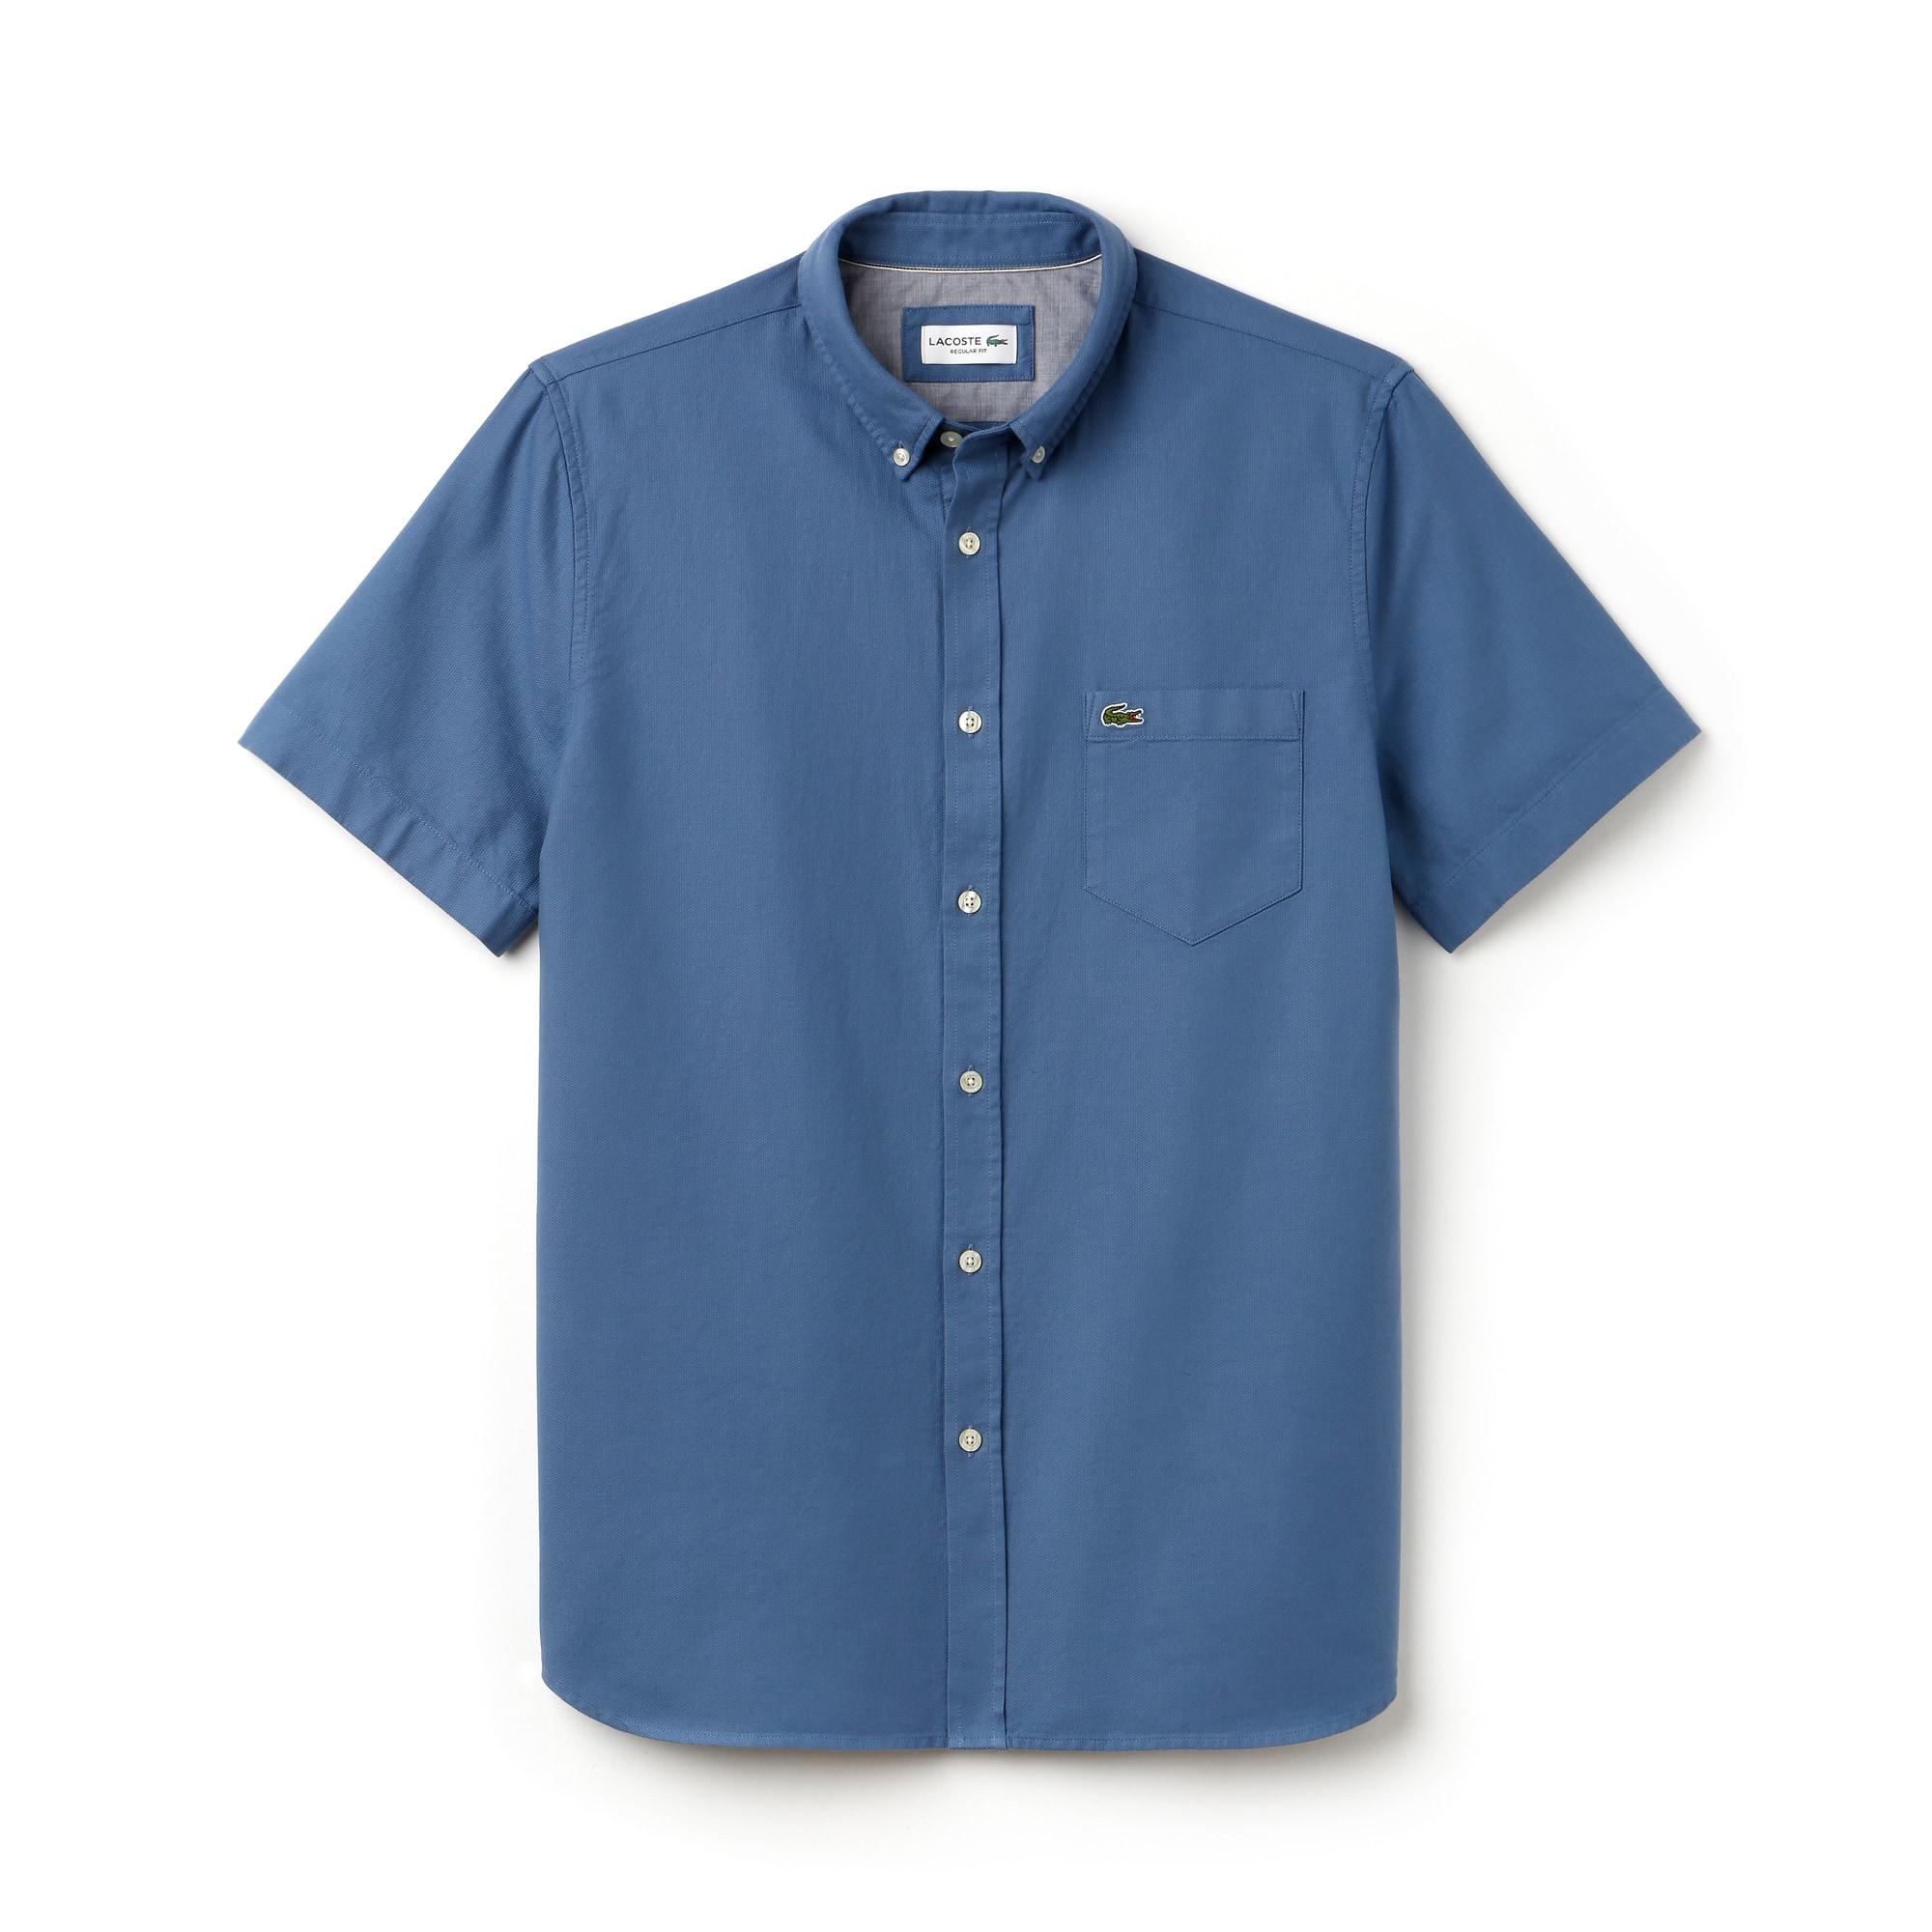 Camisa regular fit de manga curta em piqué unicolor